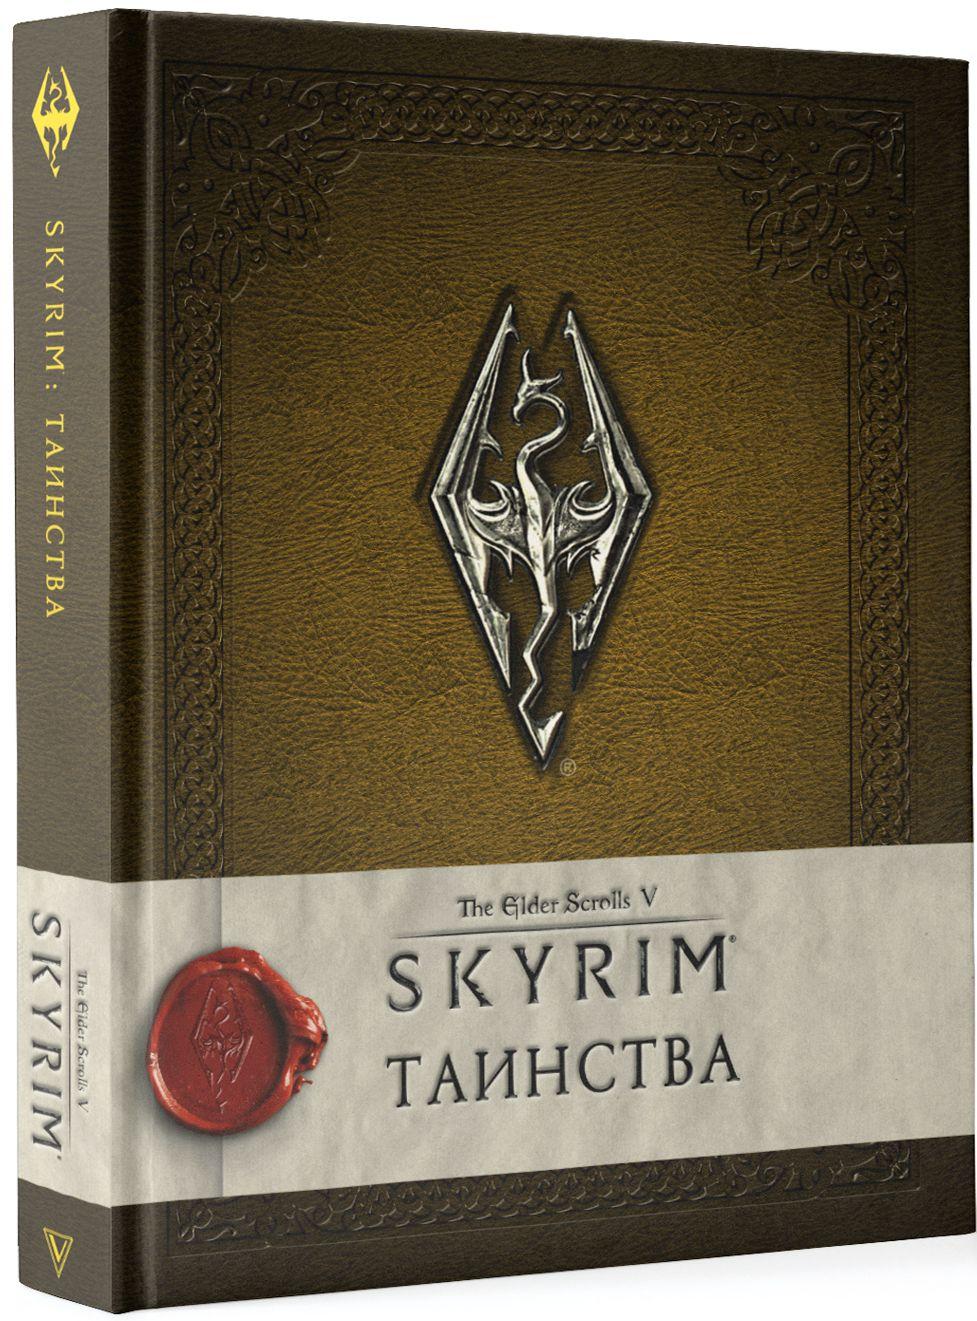 The Elder Scrolls V: Skyrim– Таинства